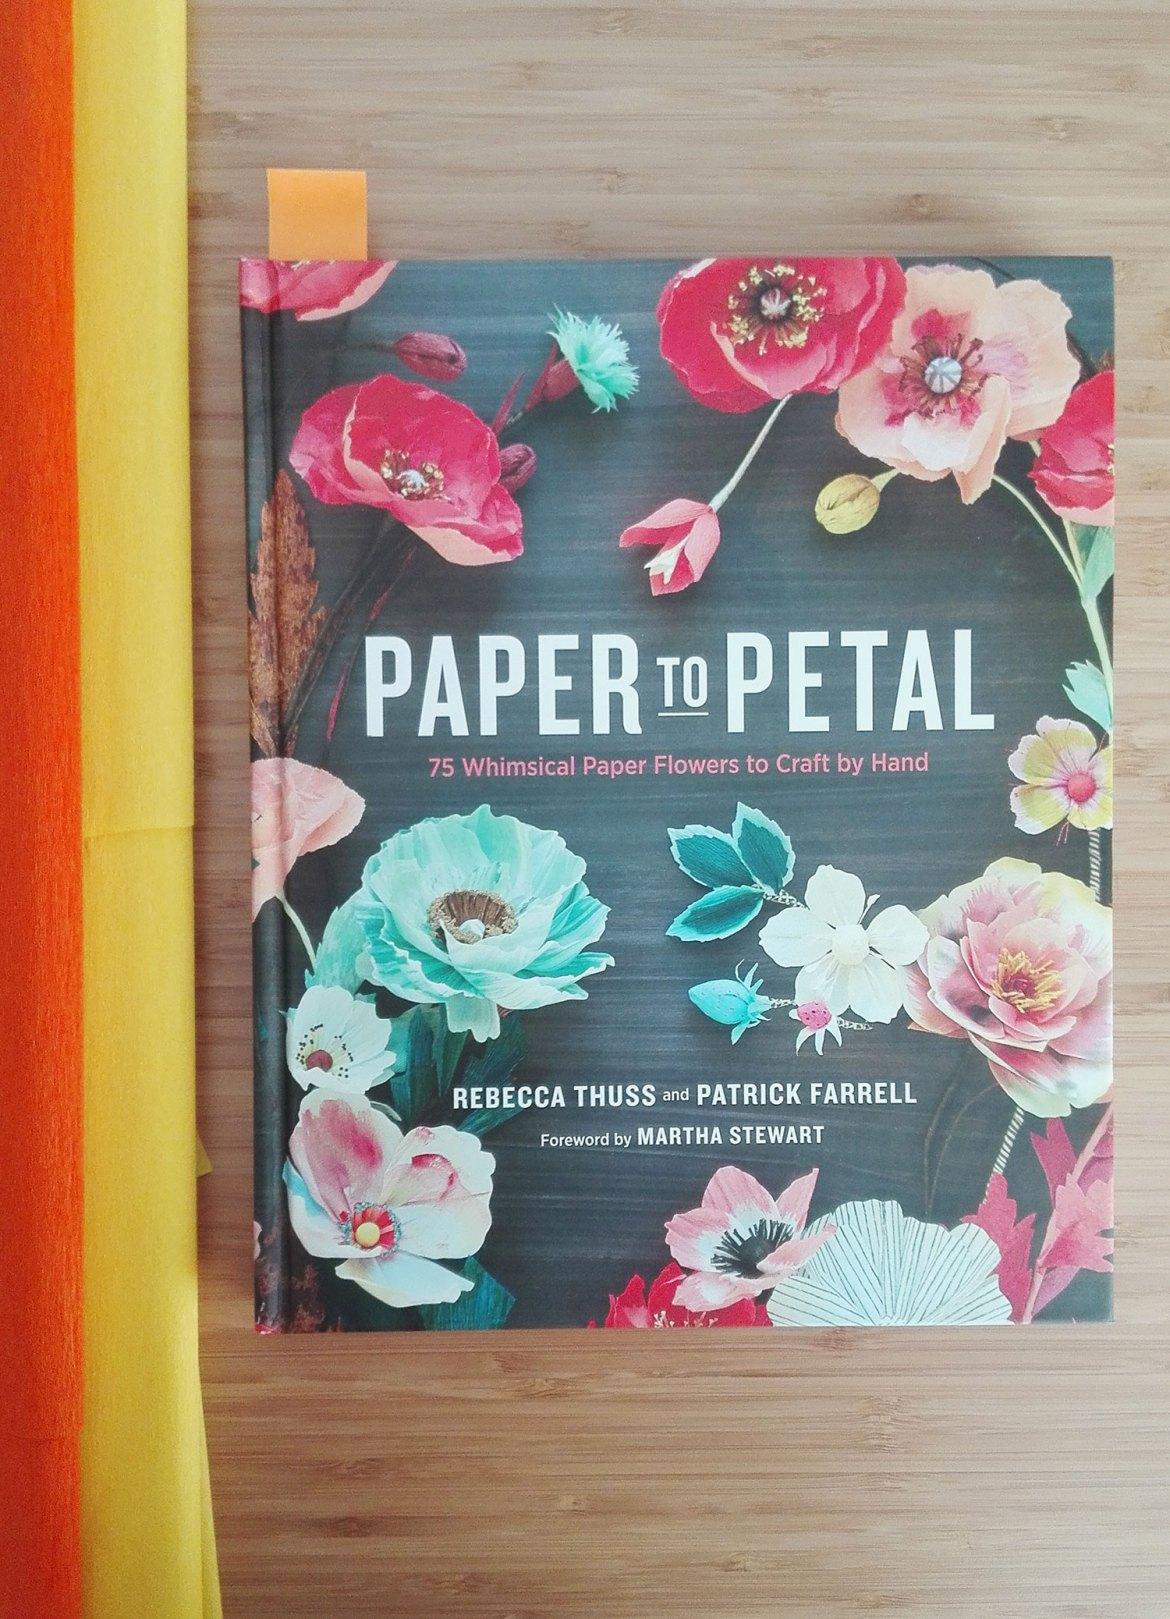 paper to petal book